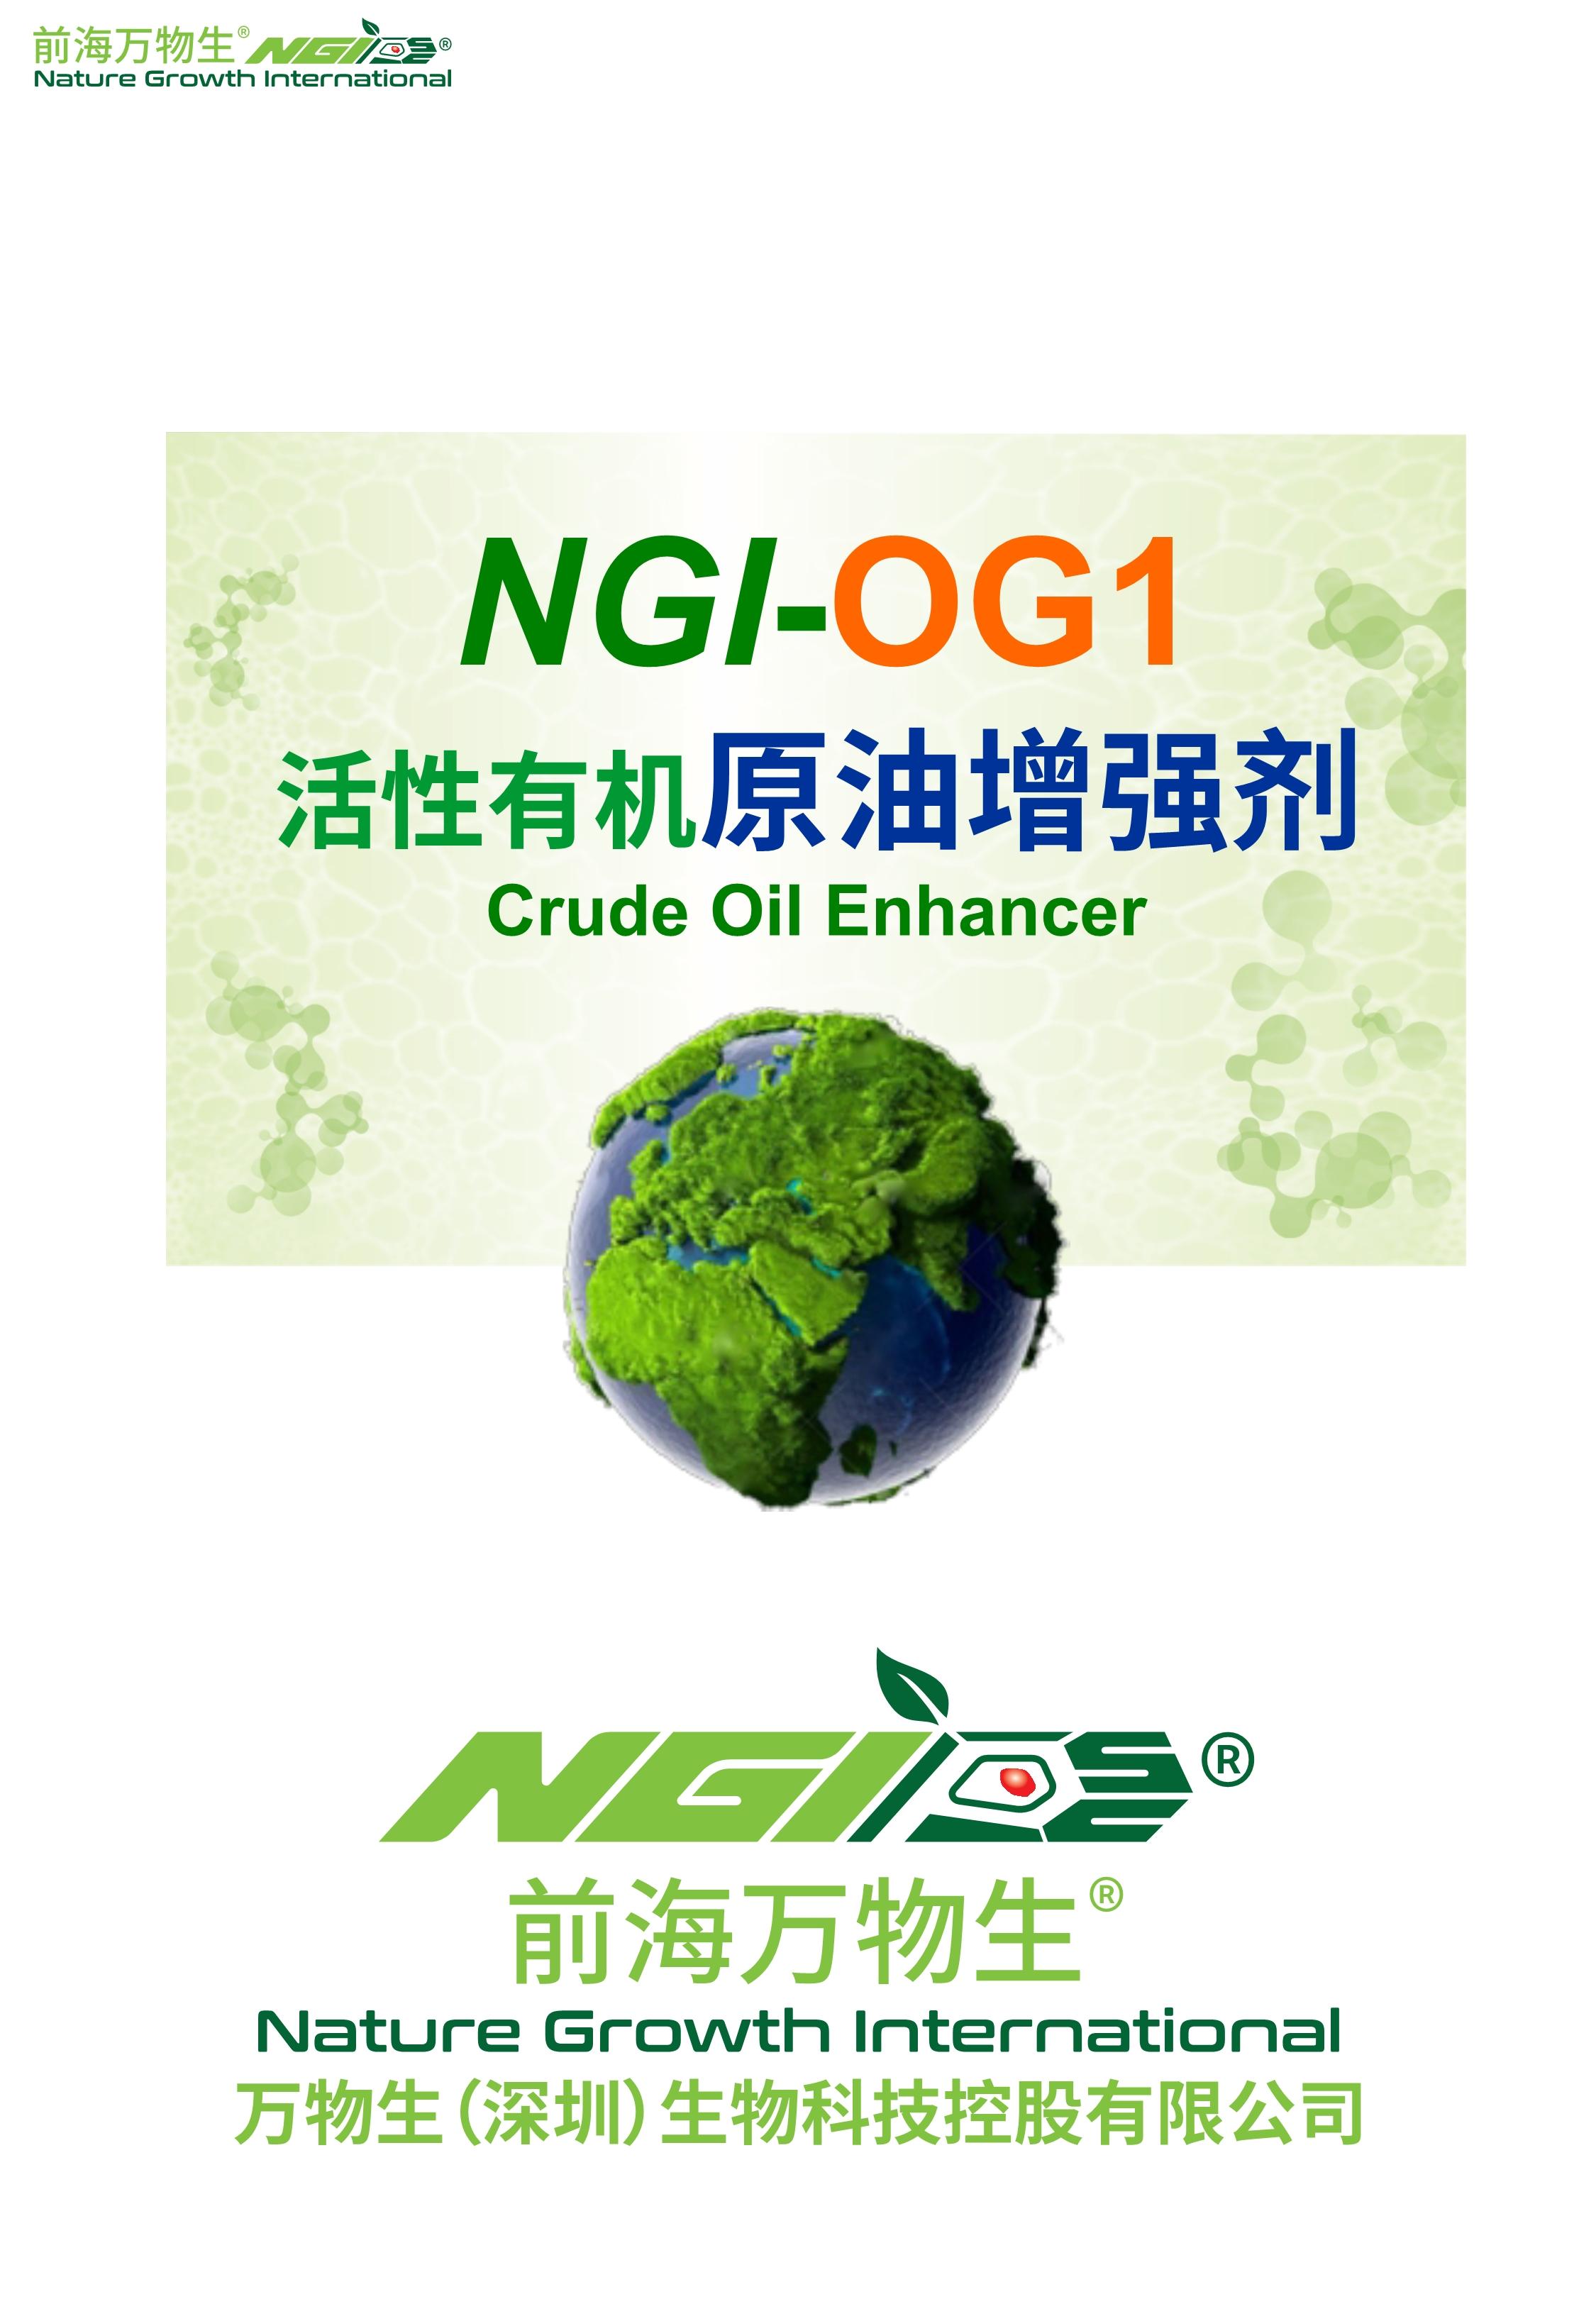 德赢Vwin-生物石油公司NGI-OG1中英20190521v3_jpg-德赢Vwin-生物石油公司NGI-OG1中英20190521v3_1